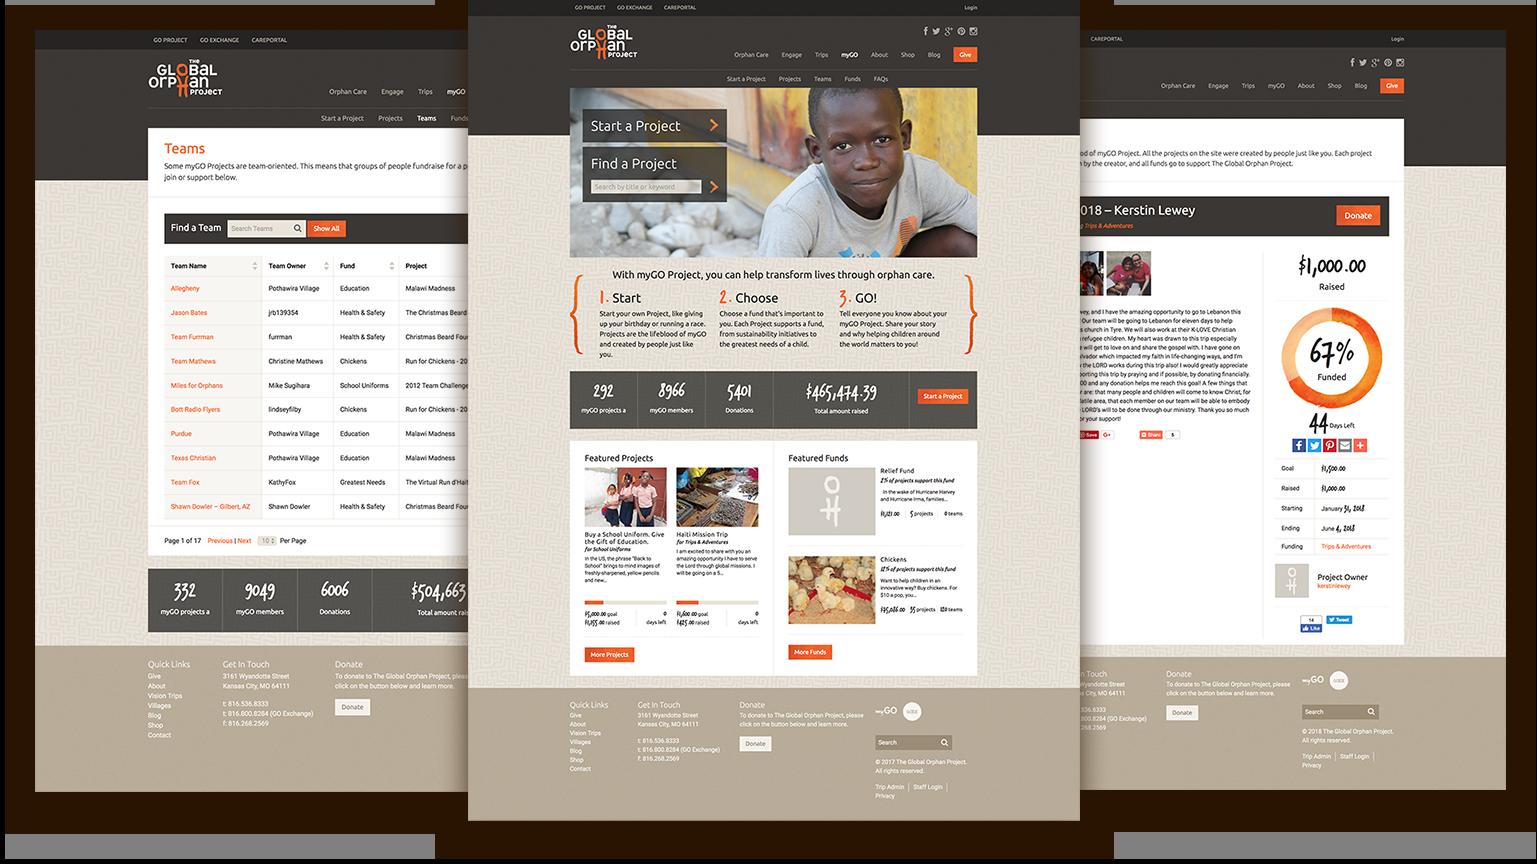 mygoproject-crowdfunding-platform-design.png